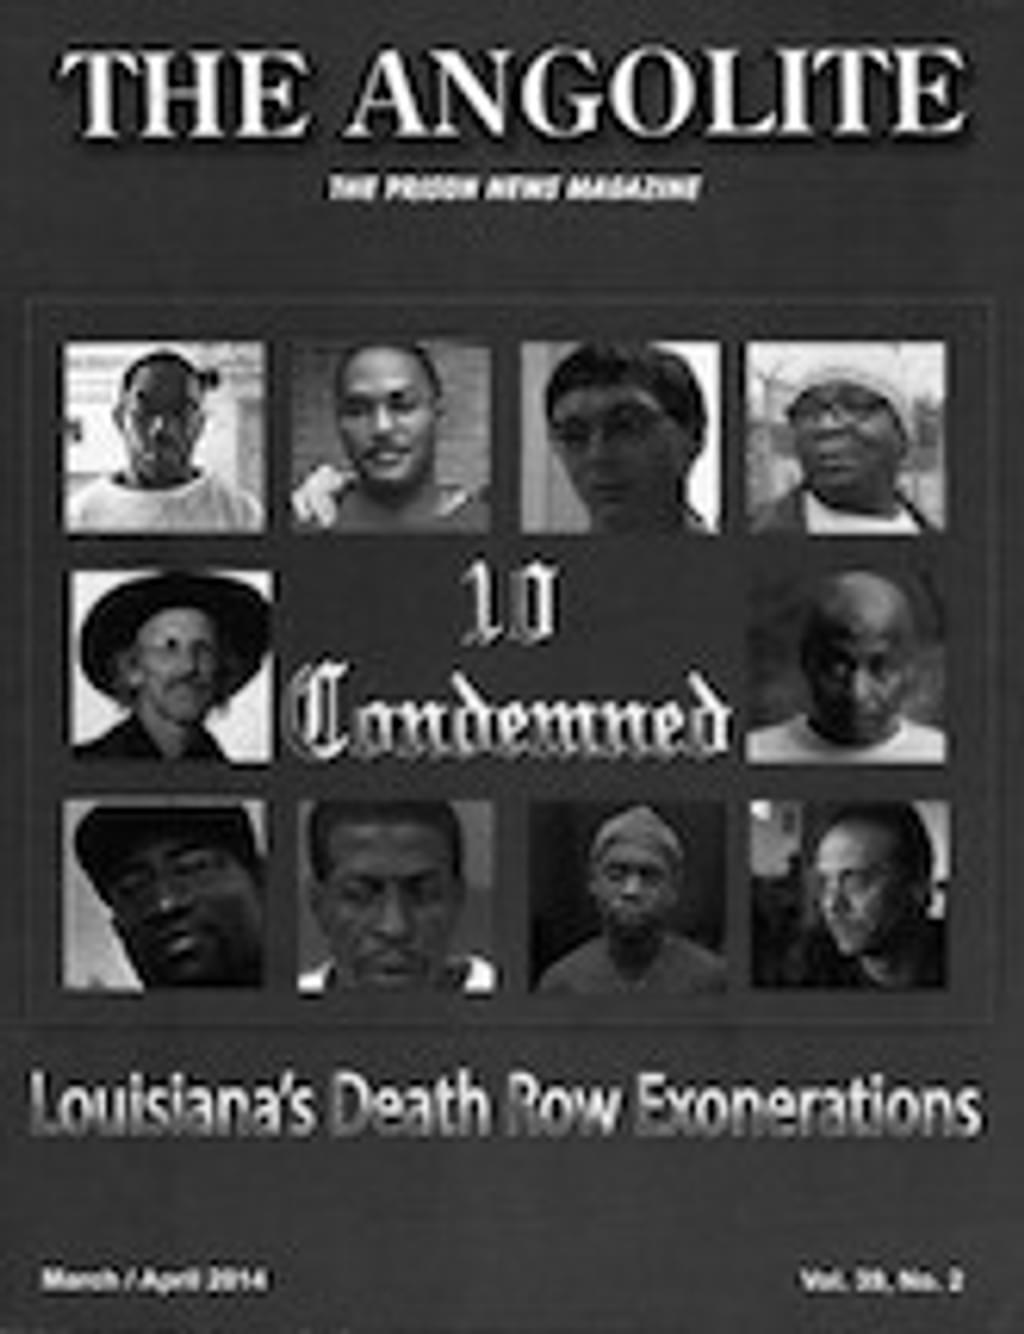 The Angolite Features Louisiana's Death Row Exonerees